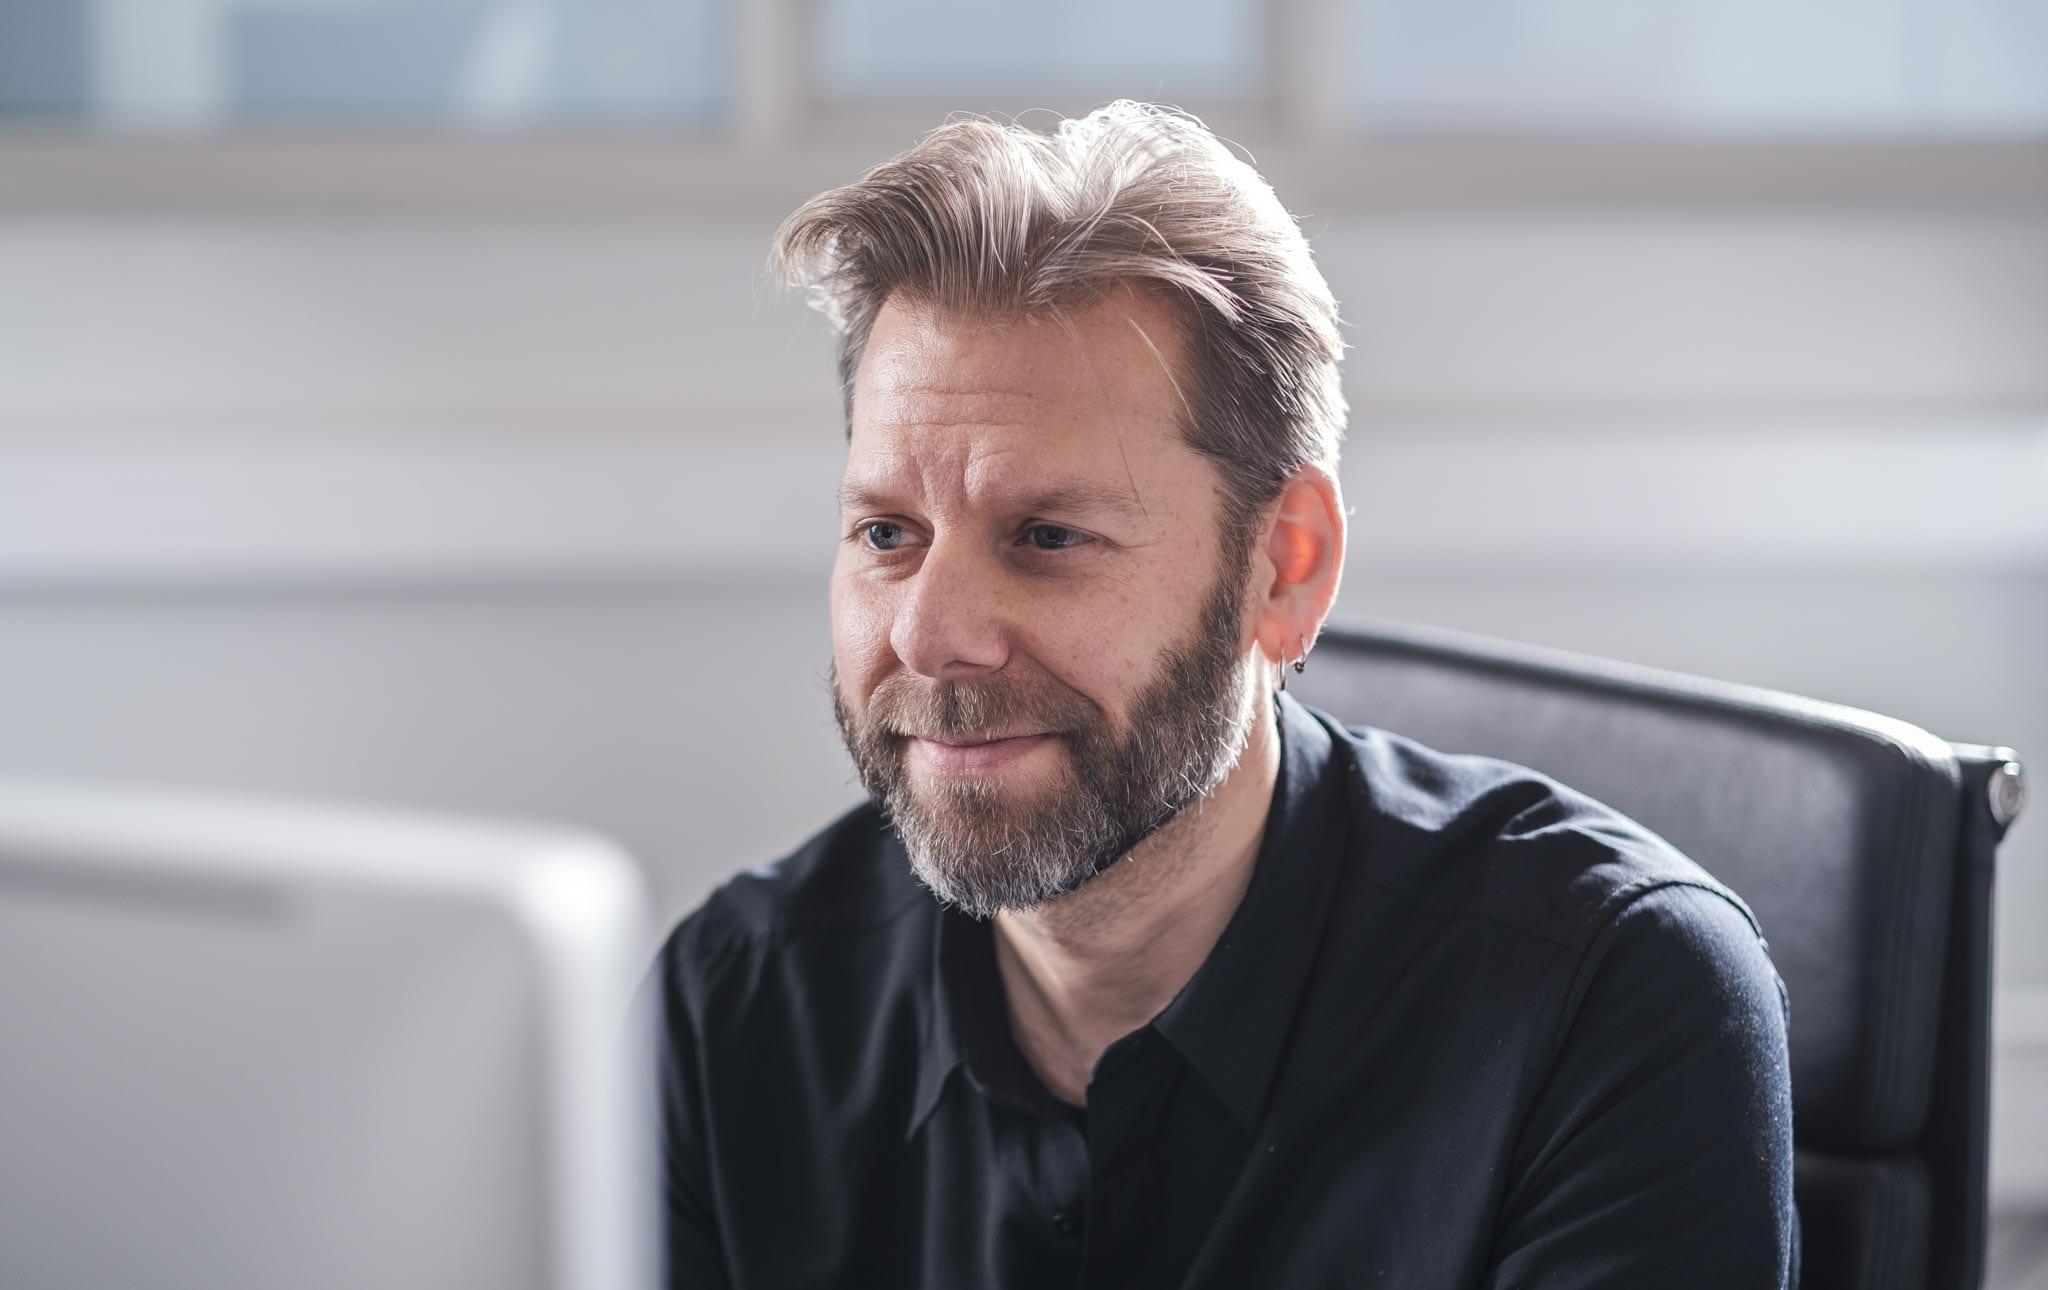 Lars Geithe